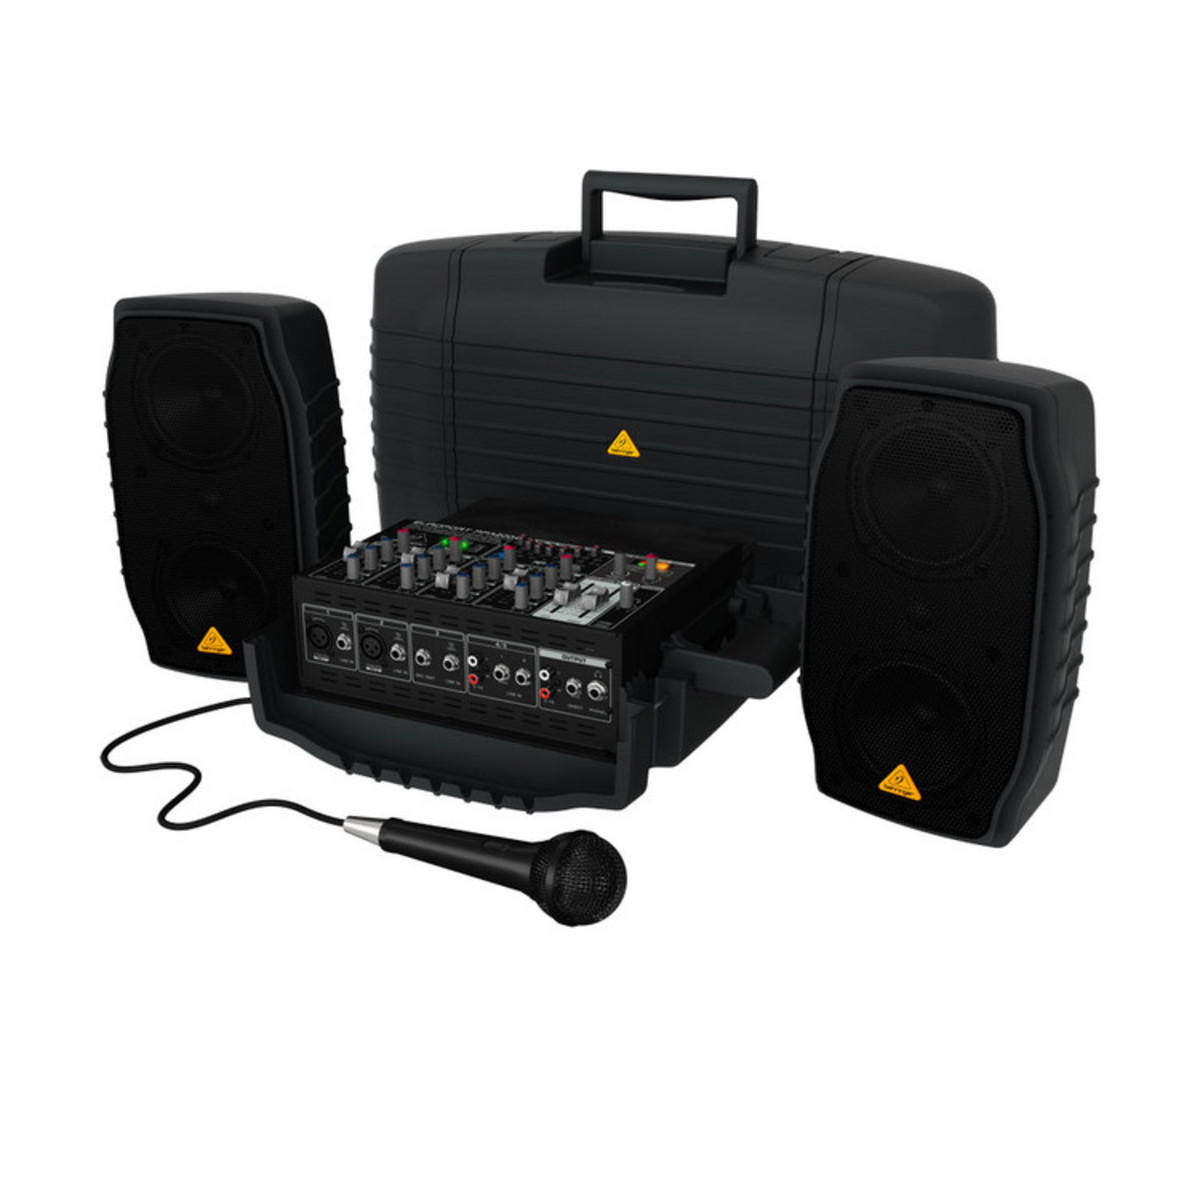 behringer europort ppa200 5 channel portable pa system box opened at. Black Bedroom Furniture Sets. Home Design Ideas